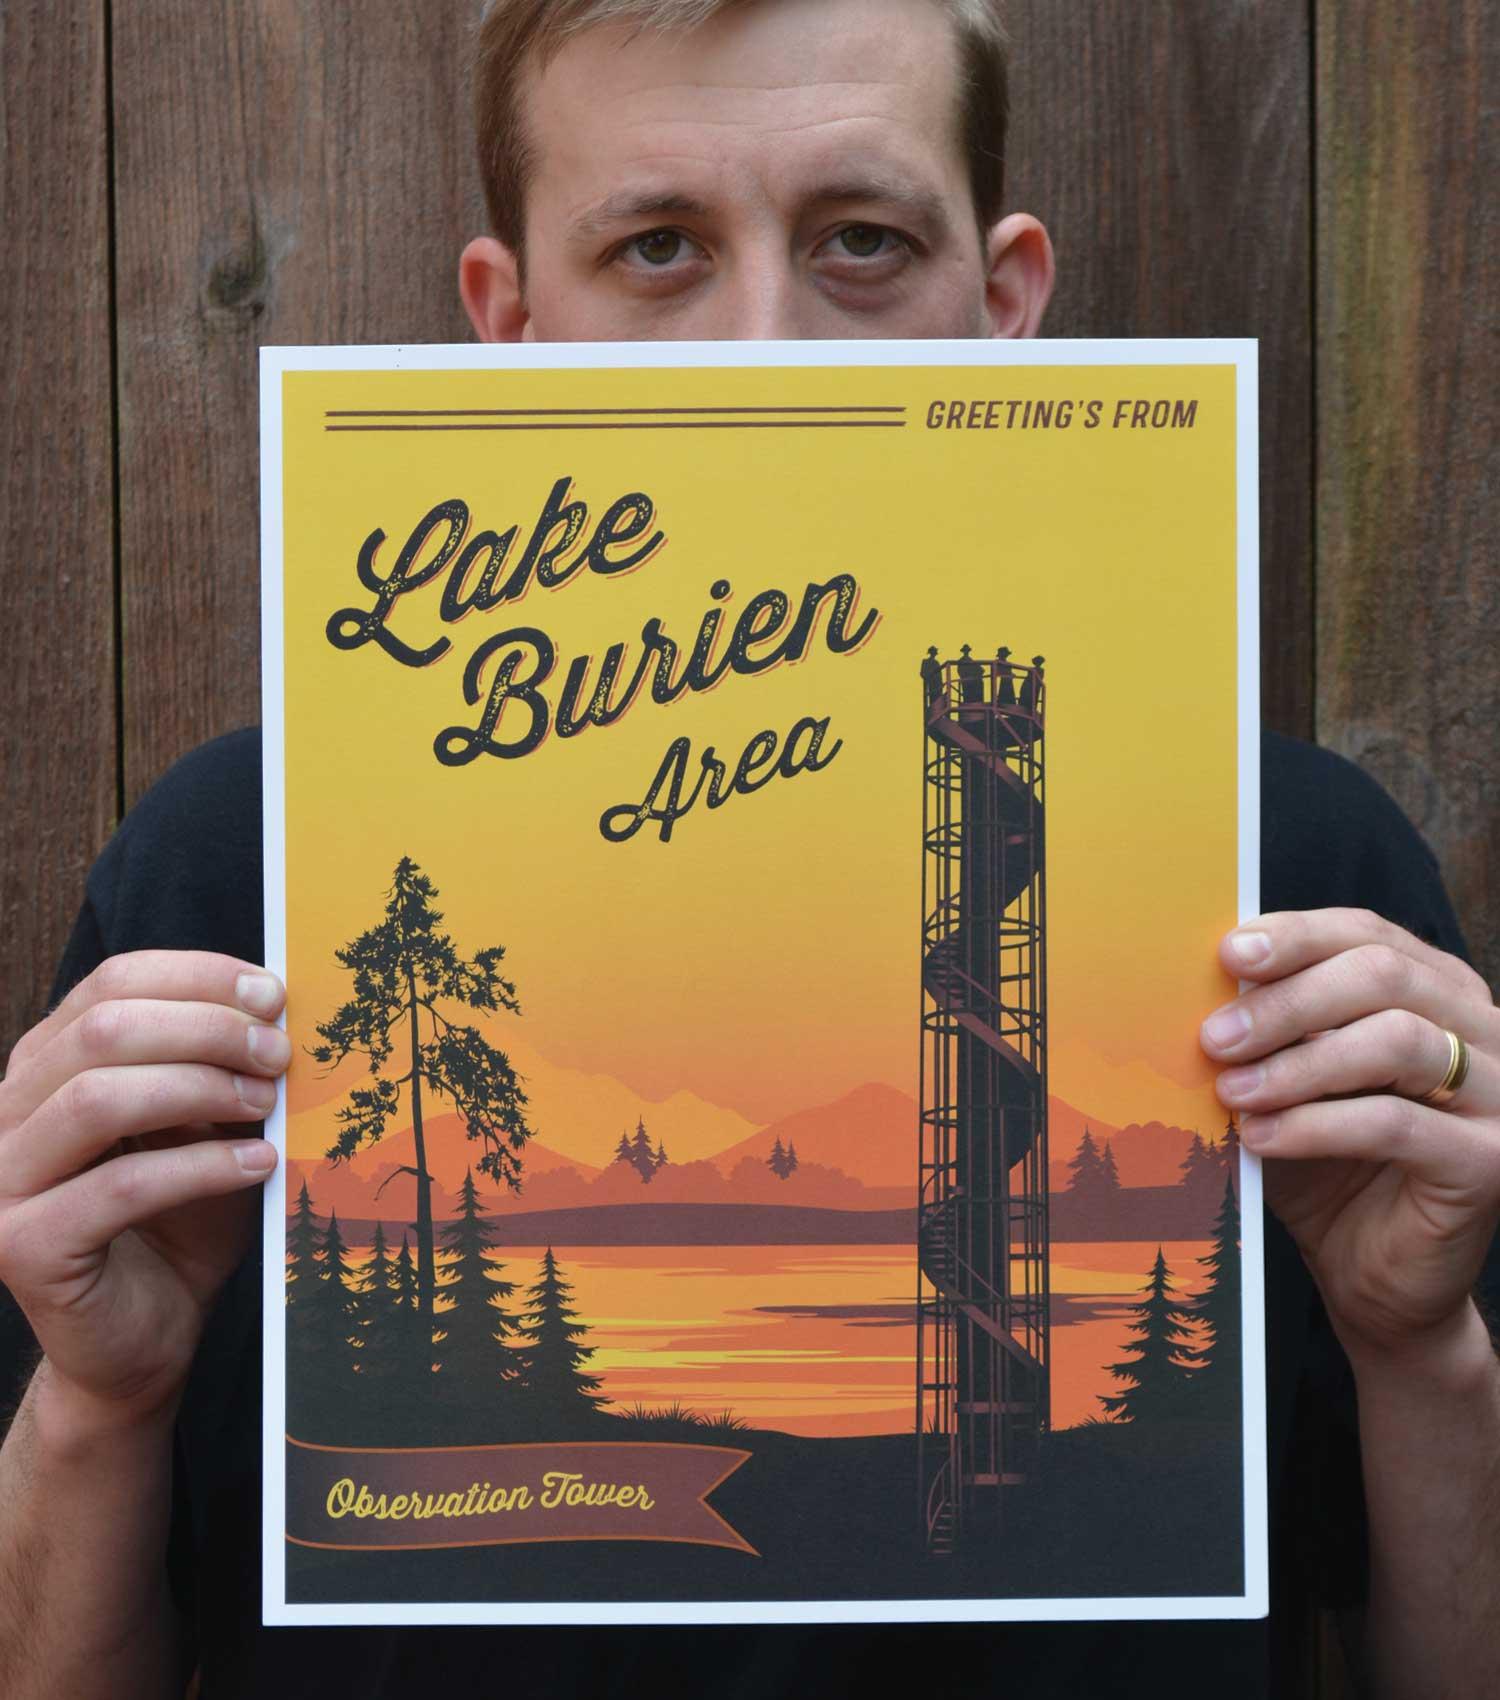 Blog_Lake_Burien_Area.jpg